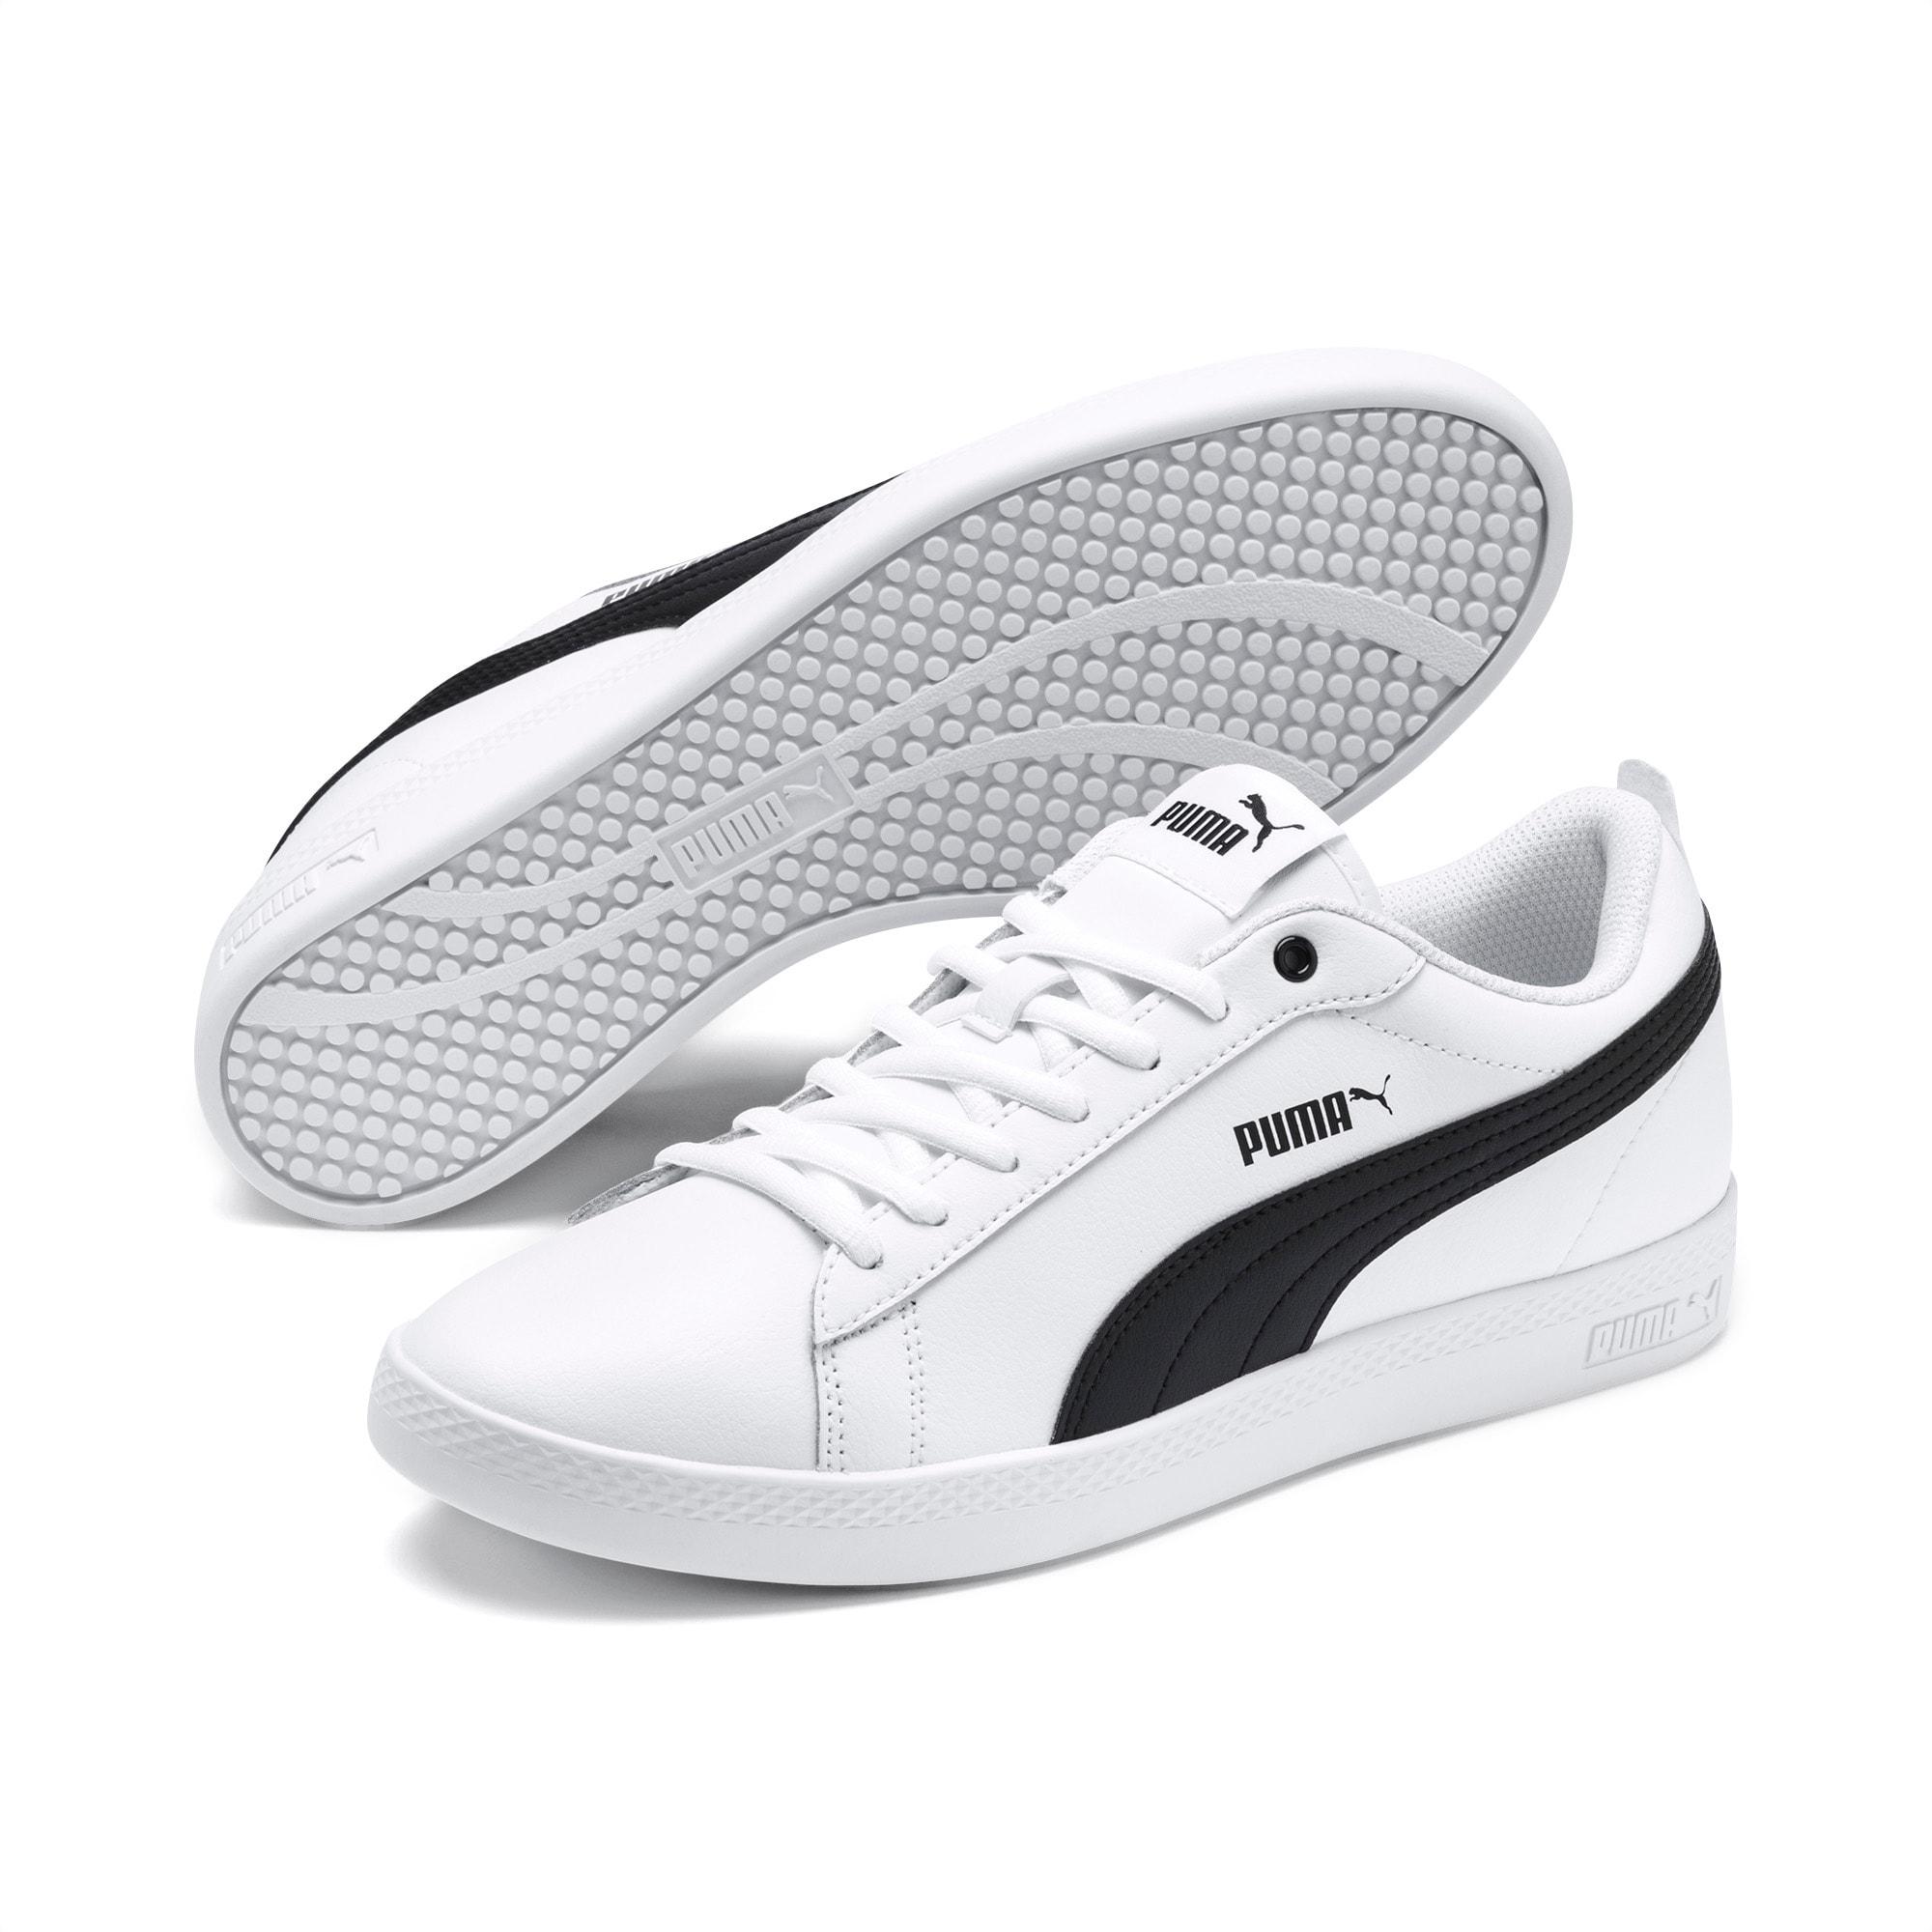 Damskie buty sportowe ze skóry Smash v2